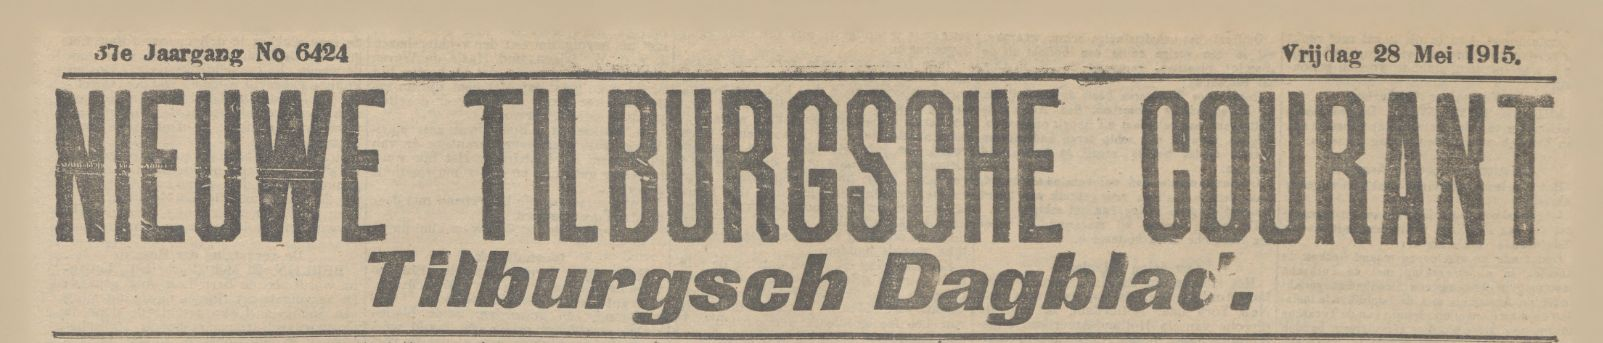 http://www.peopleofar.com/wp-content/uploads/Tilburgsche-Courant.jpg